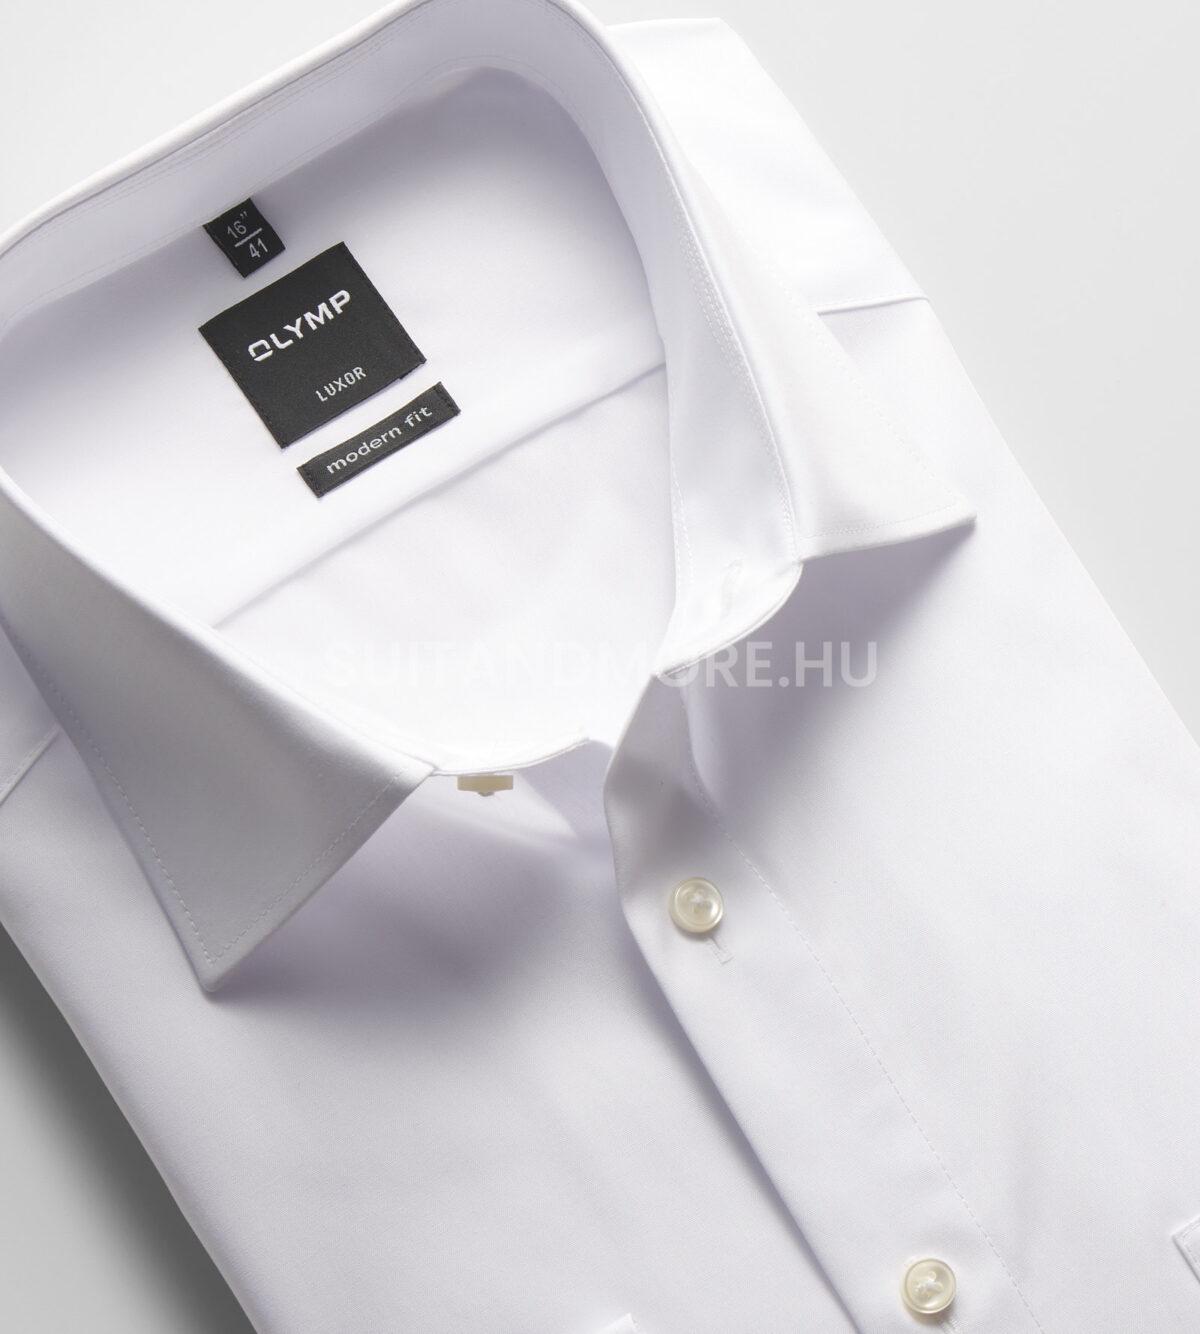 olymp-luxor-feher-modern-fit-vasalasmentes-ing-0300-64-00-02